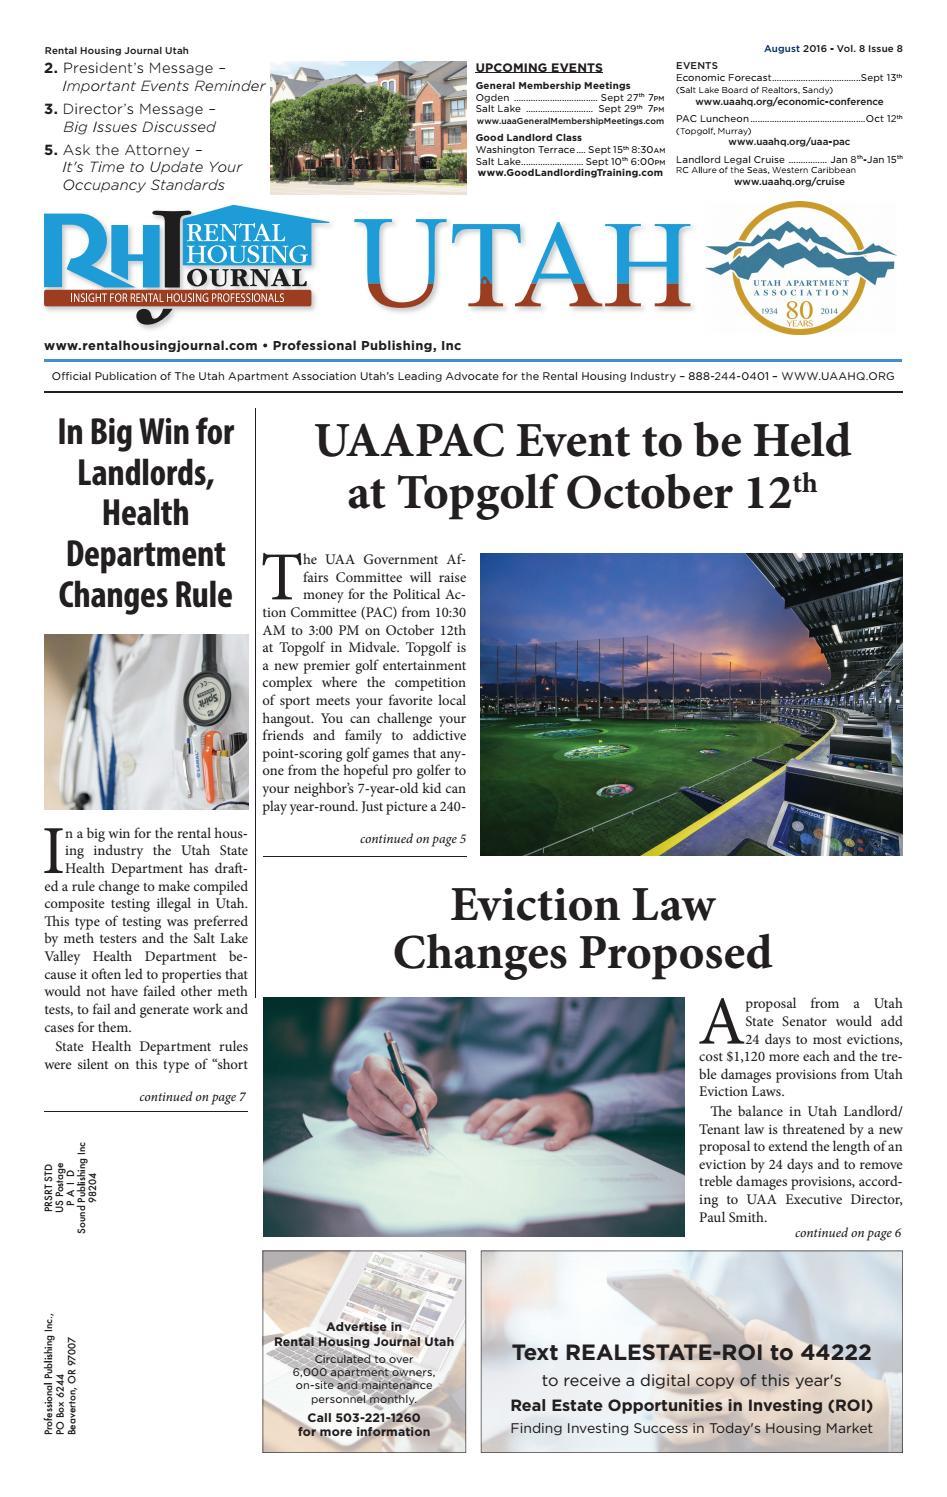 Rental Housing Journal Utah August 2016 by Professional Publishing